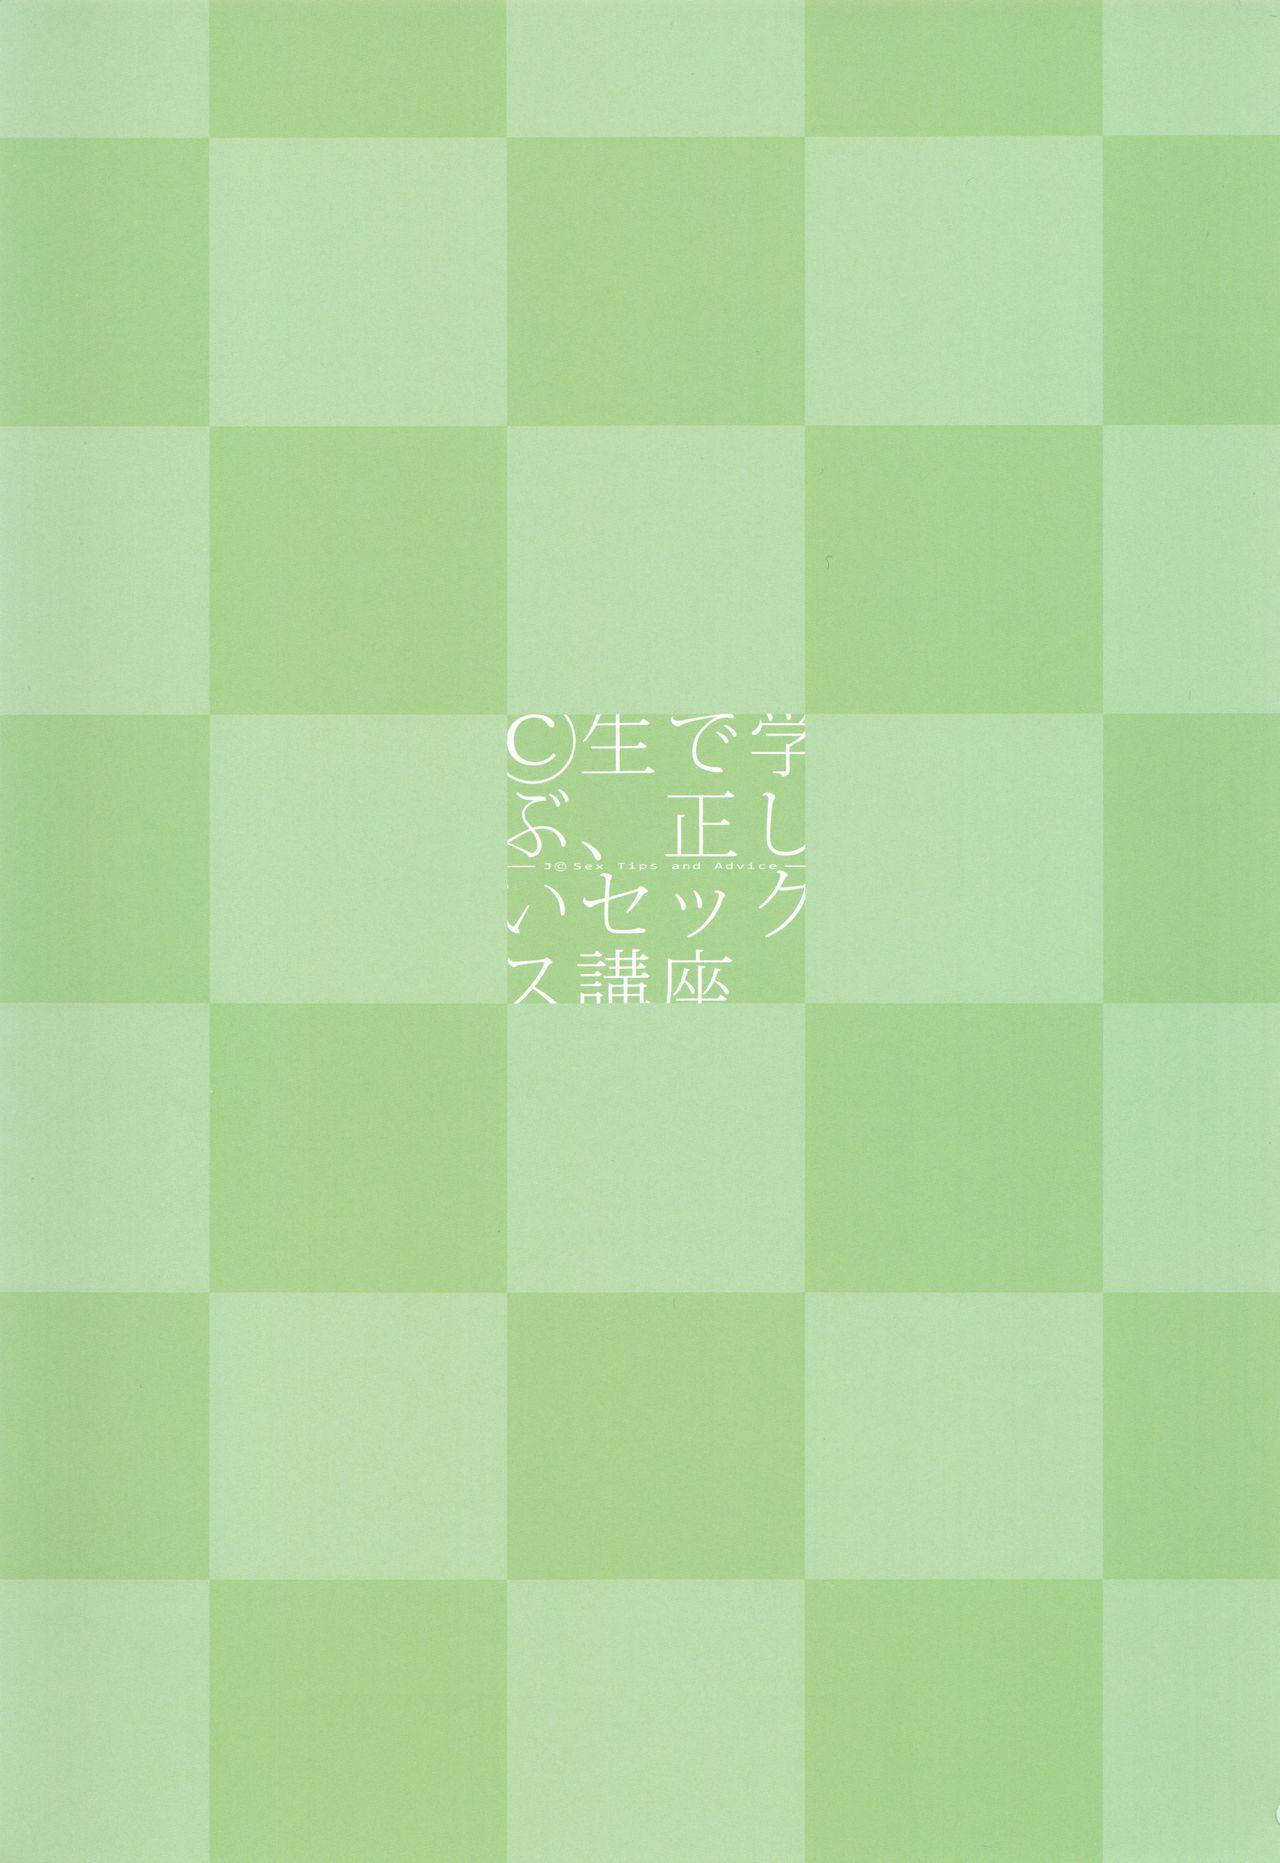 [Peromex (Tamanoi Peromekuri)] ©-sei de Manabu, Tadashii Sex Kouza | JC Hands-On Proper Sex Lecture [English] [bientaimon] [2019-11-09] 1